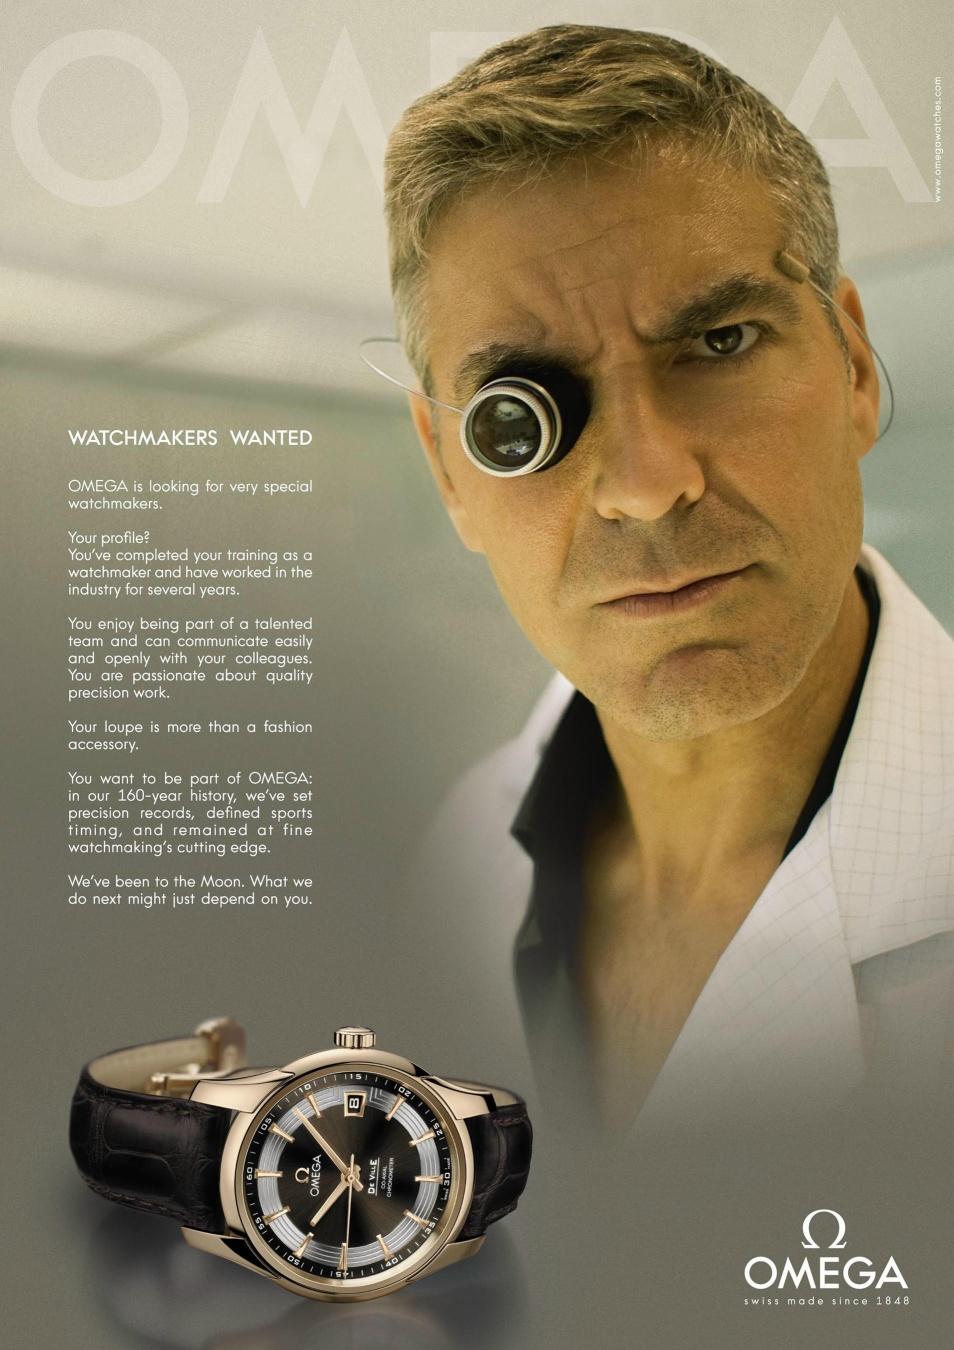 Actu : George Clooney devient horloger pour Omega Clooney